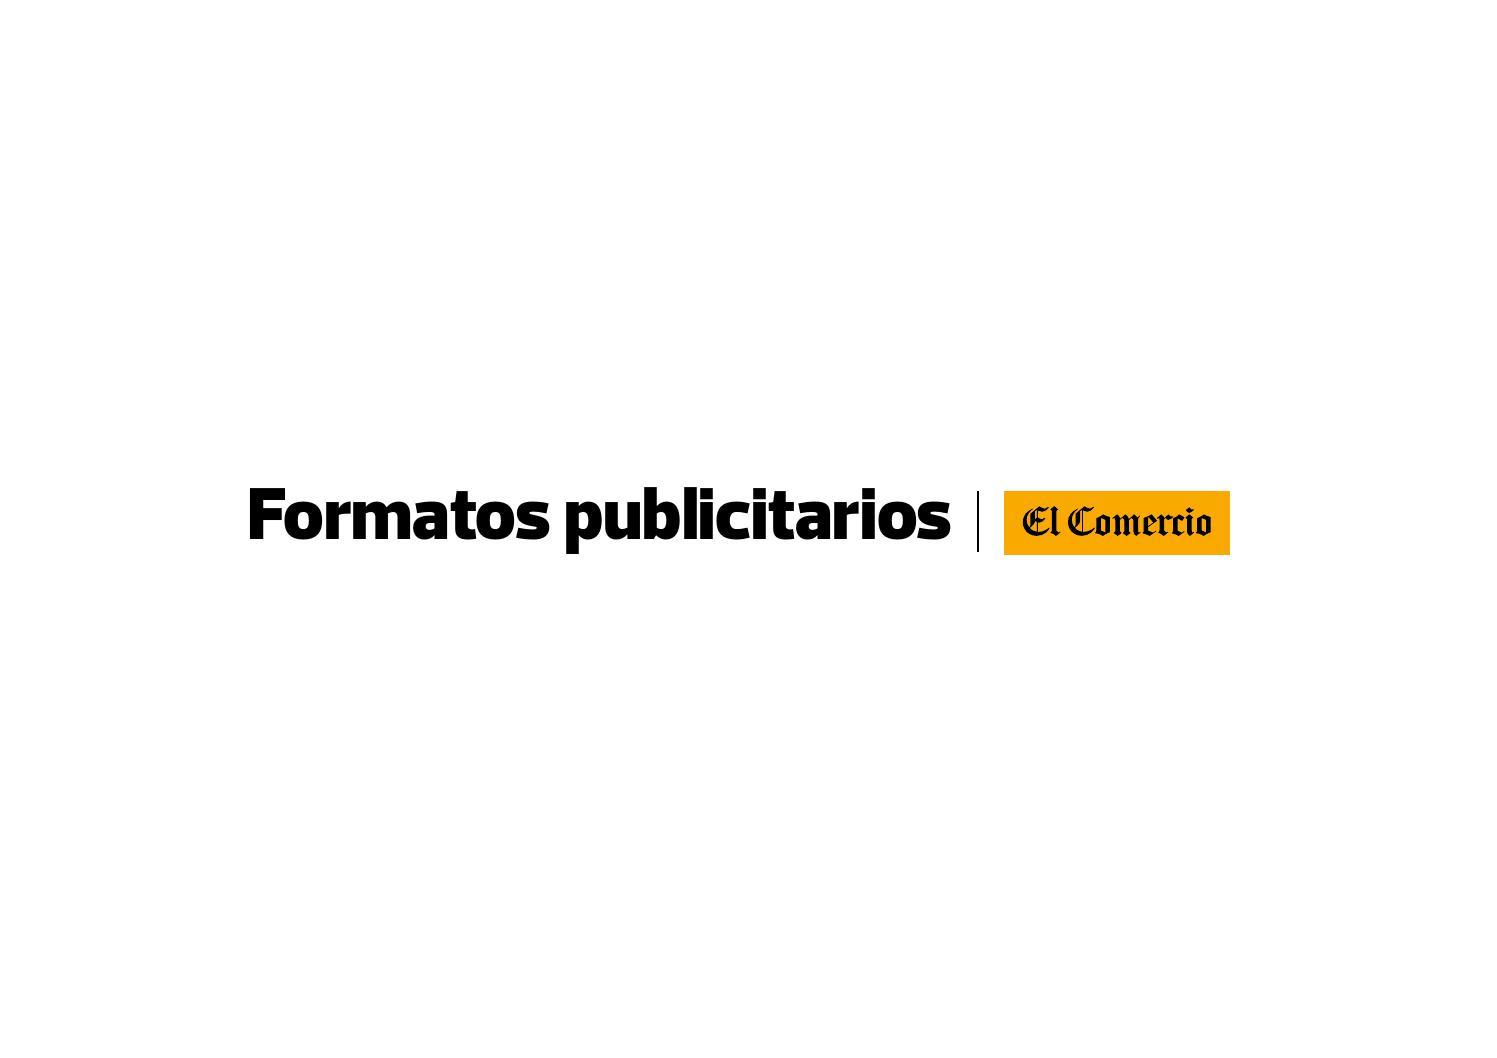 Formato%20no%20convencional%20cam by jose angel blanco - issuu